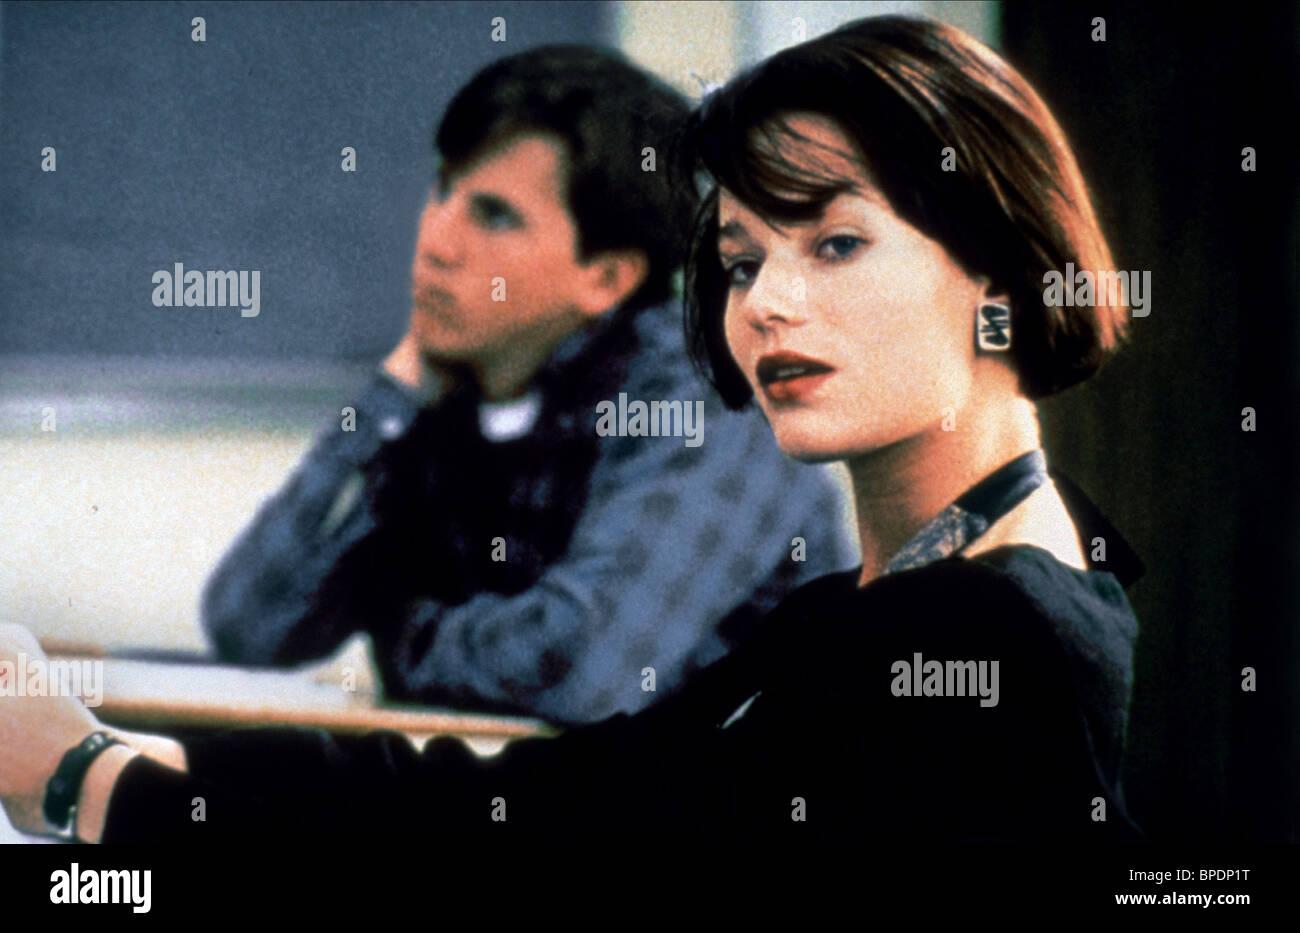 SAMANTHA MATHIS PUMP UP THE VOLUME (1990) - Stock Image